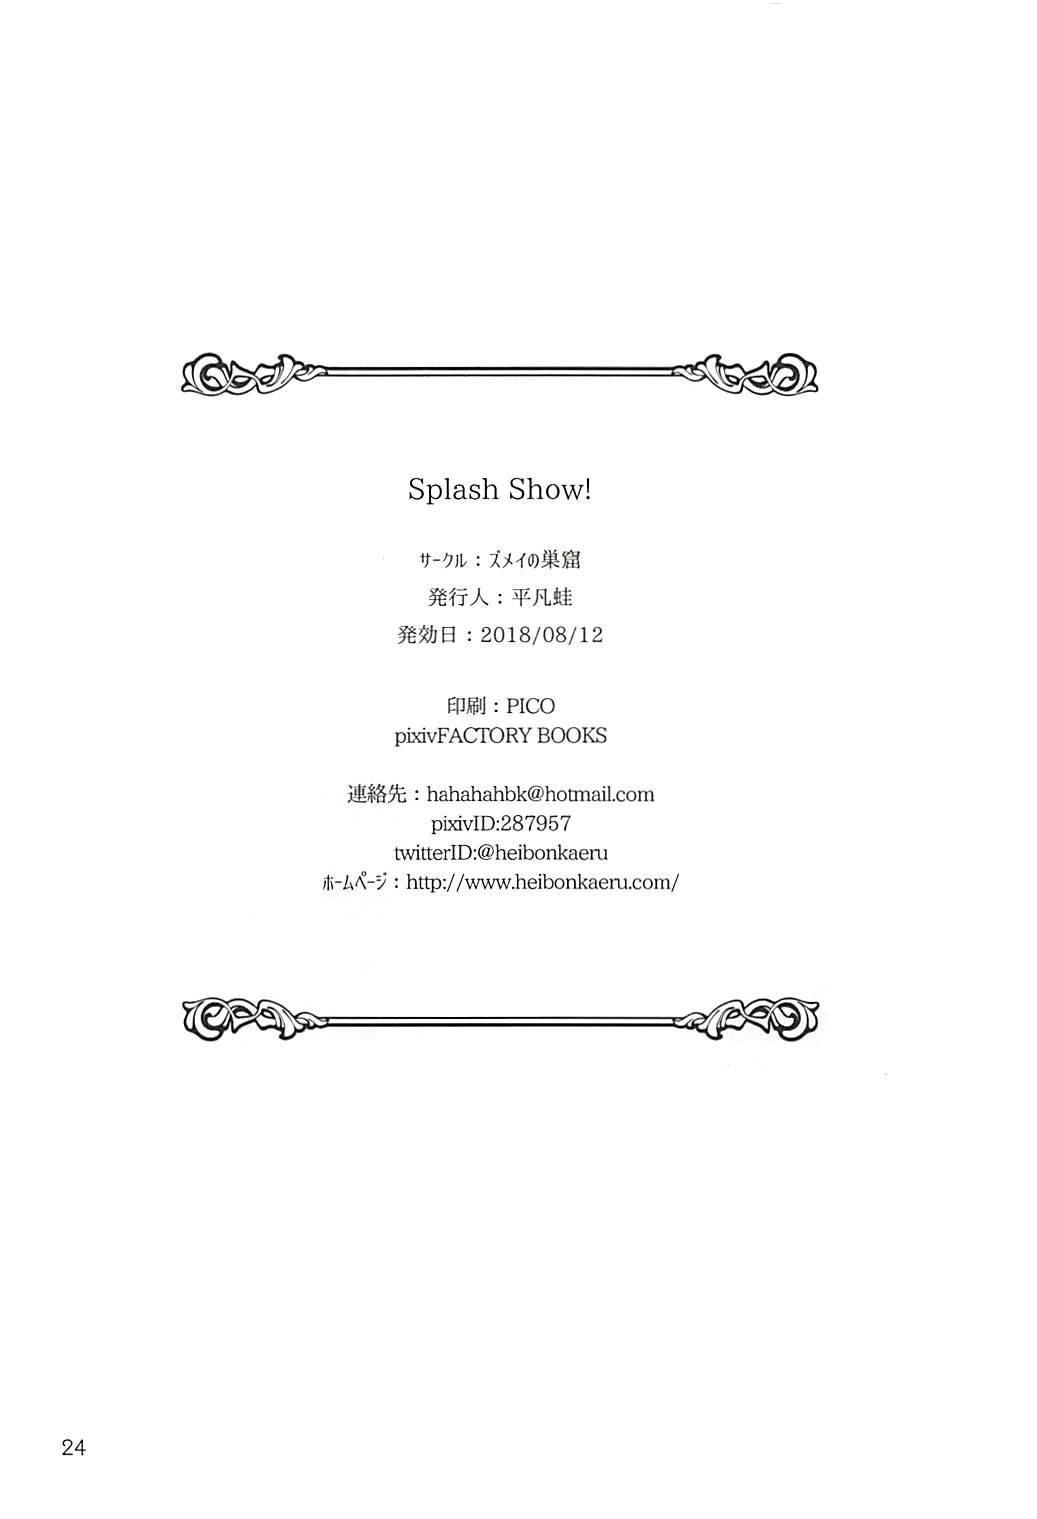 Splash Show! 22